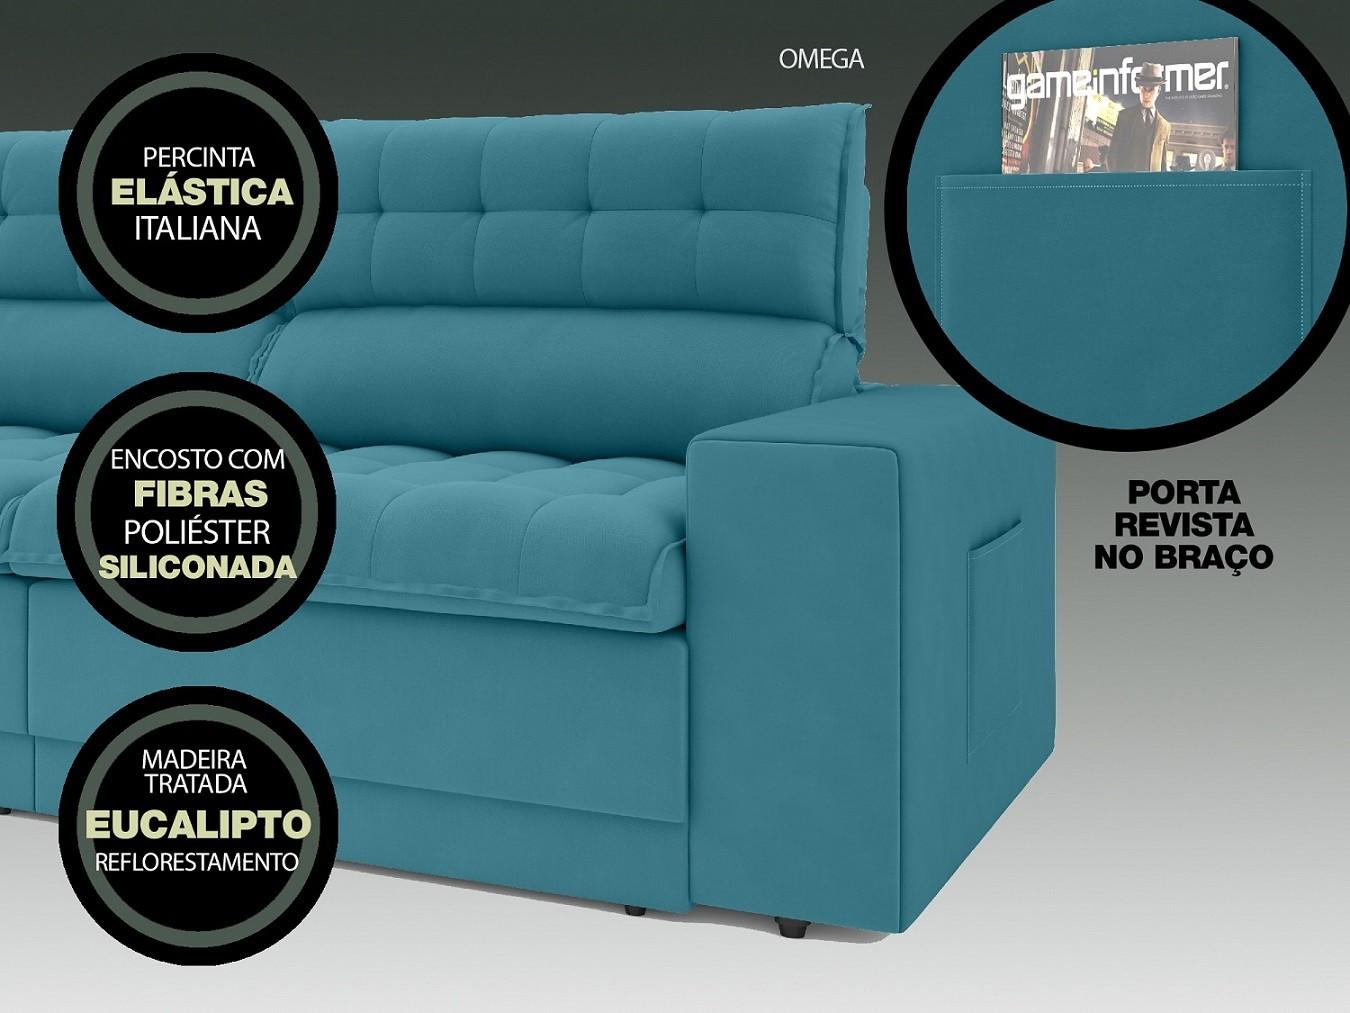 Sofá Omega 2,50m Assento Retrátil e Reclinável Velosuede Turquesa - NETSOFAS  - NETSOFÁS